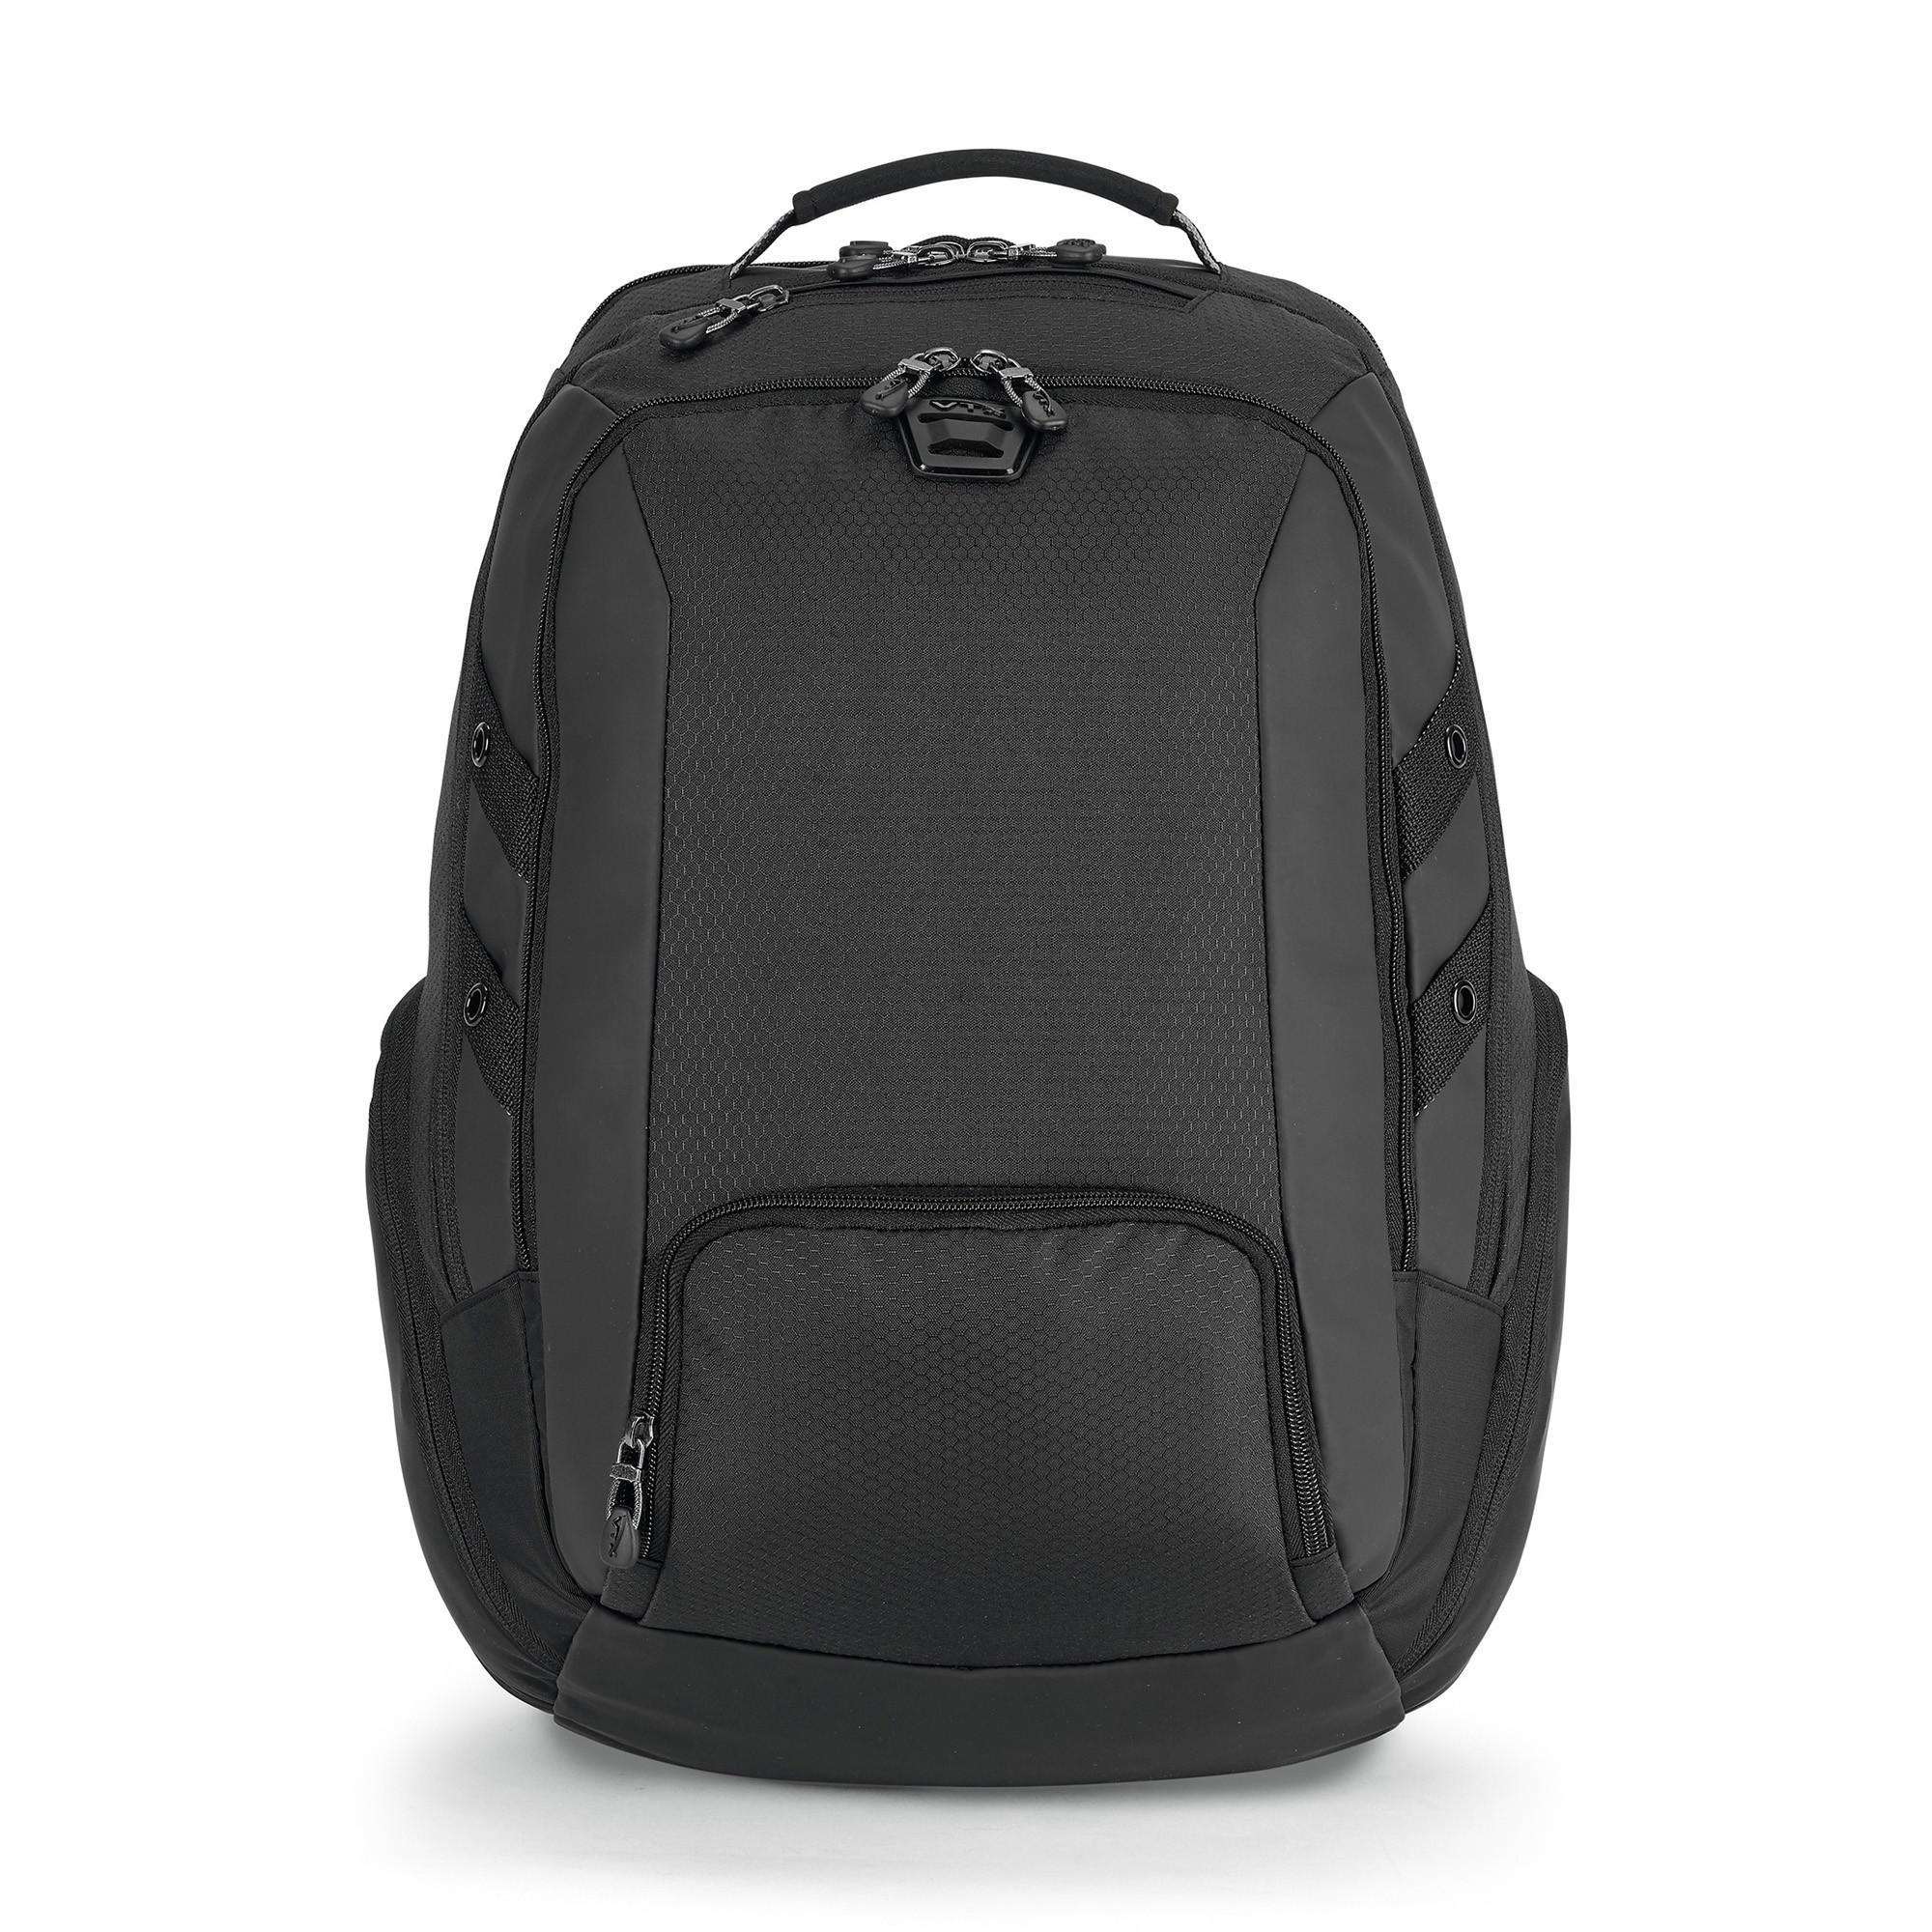 Vertex 5385 - Carbon Computer Backpack